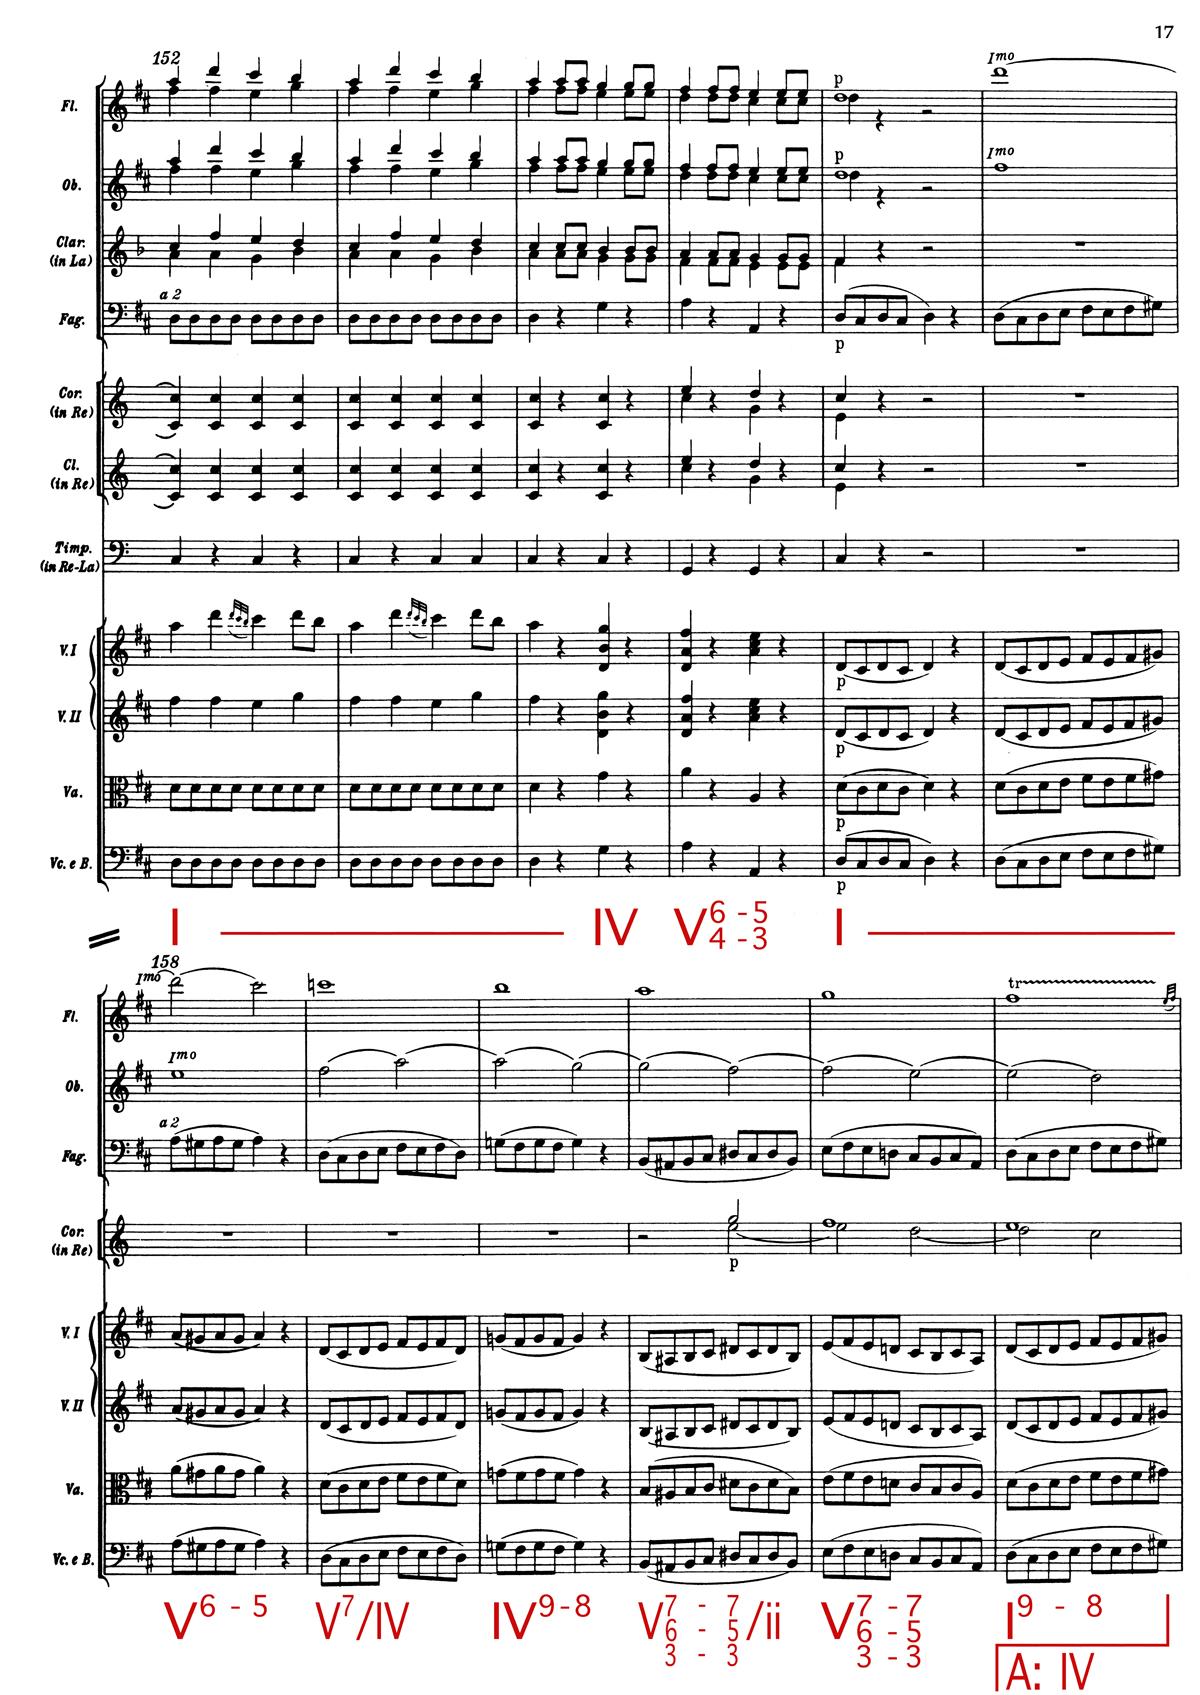 Mozart_Figaro_Theory_6.jpg